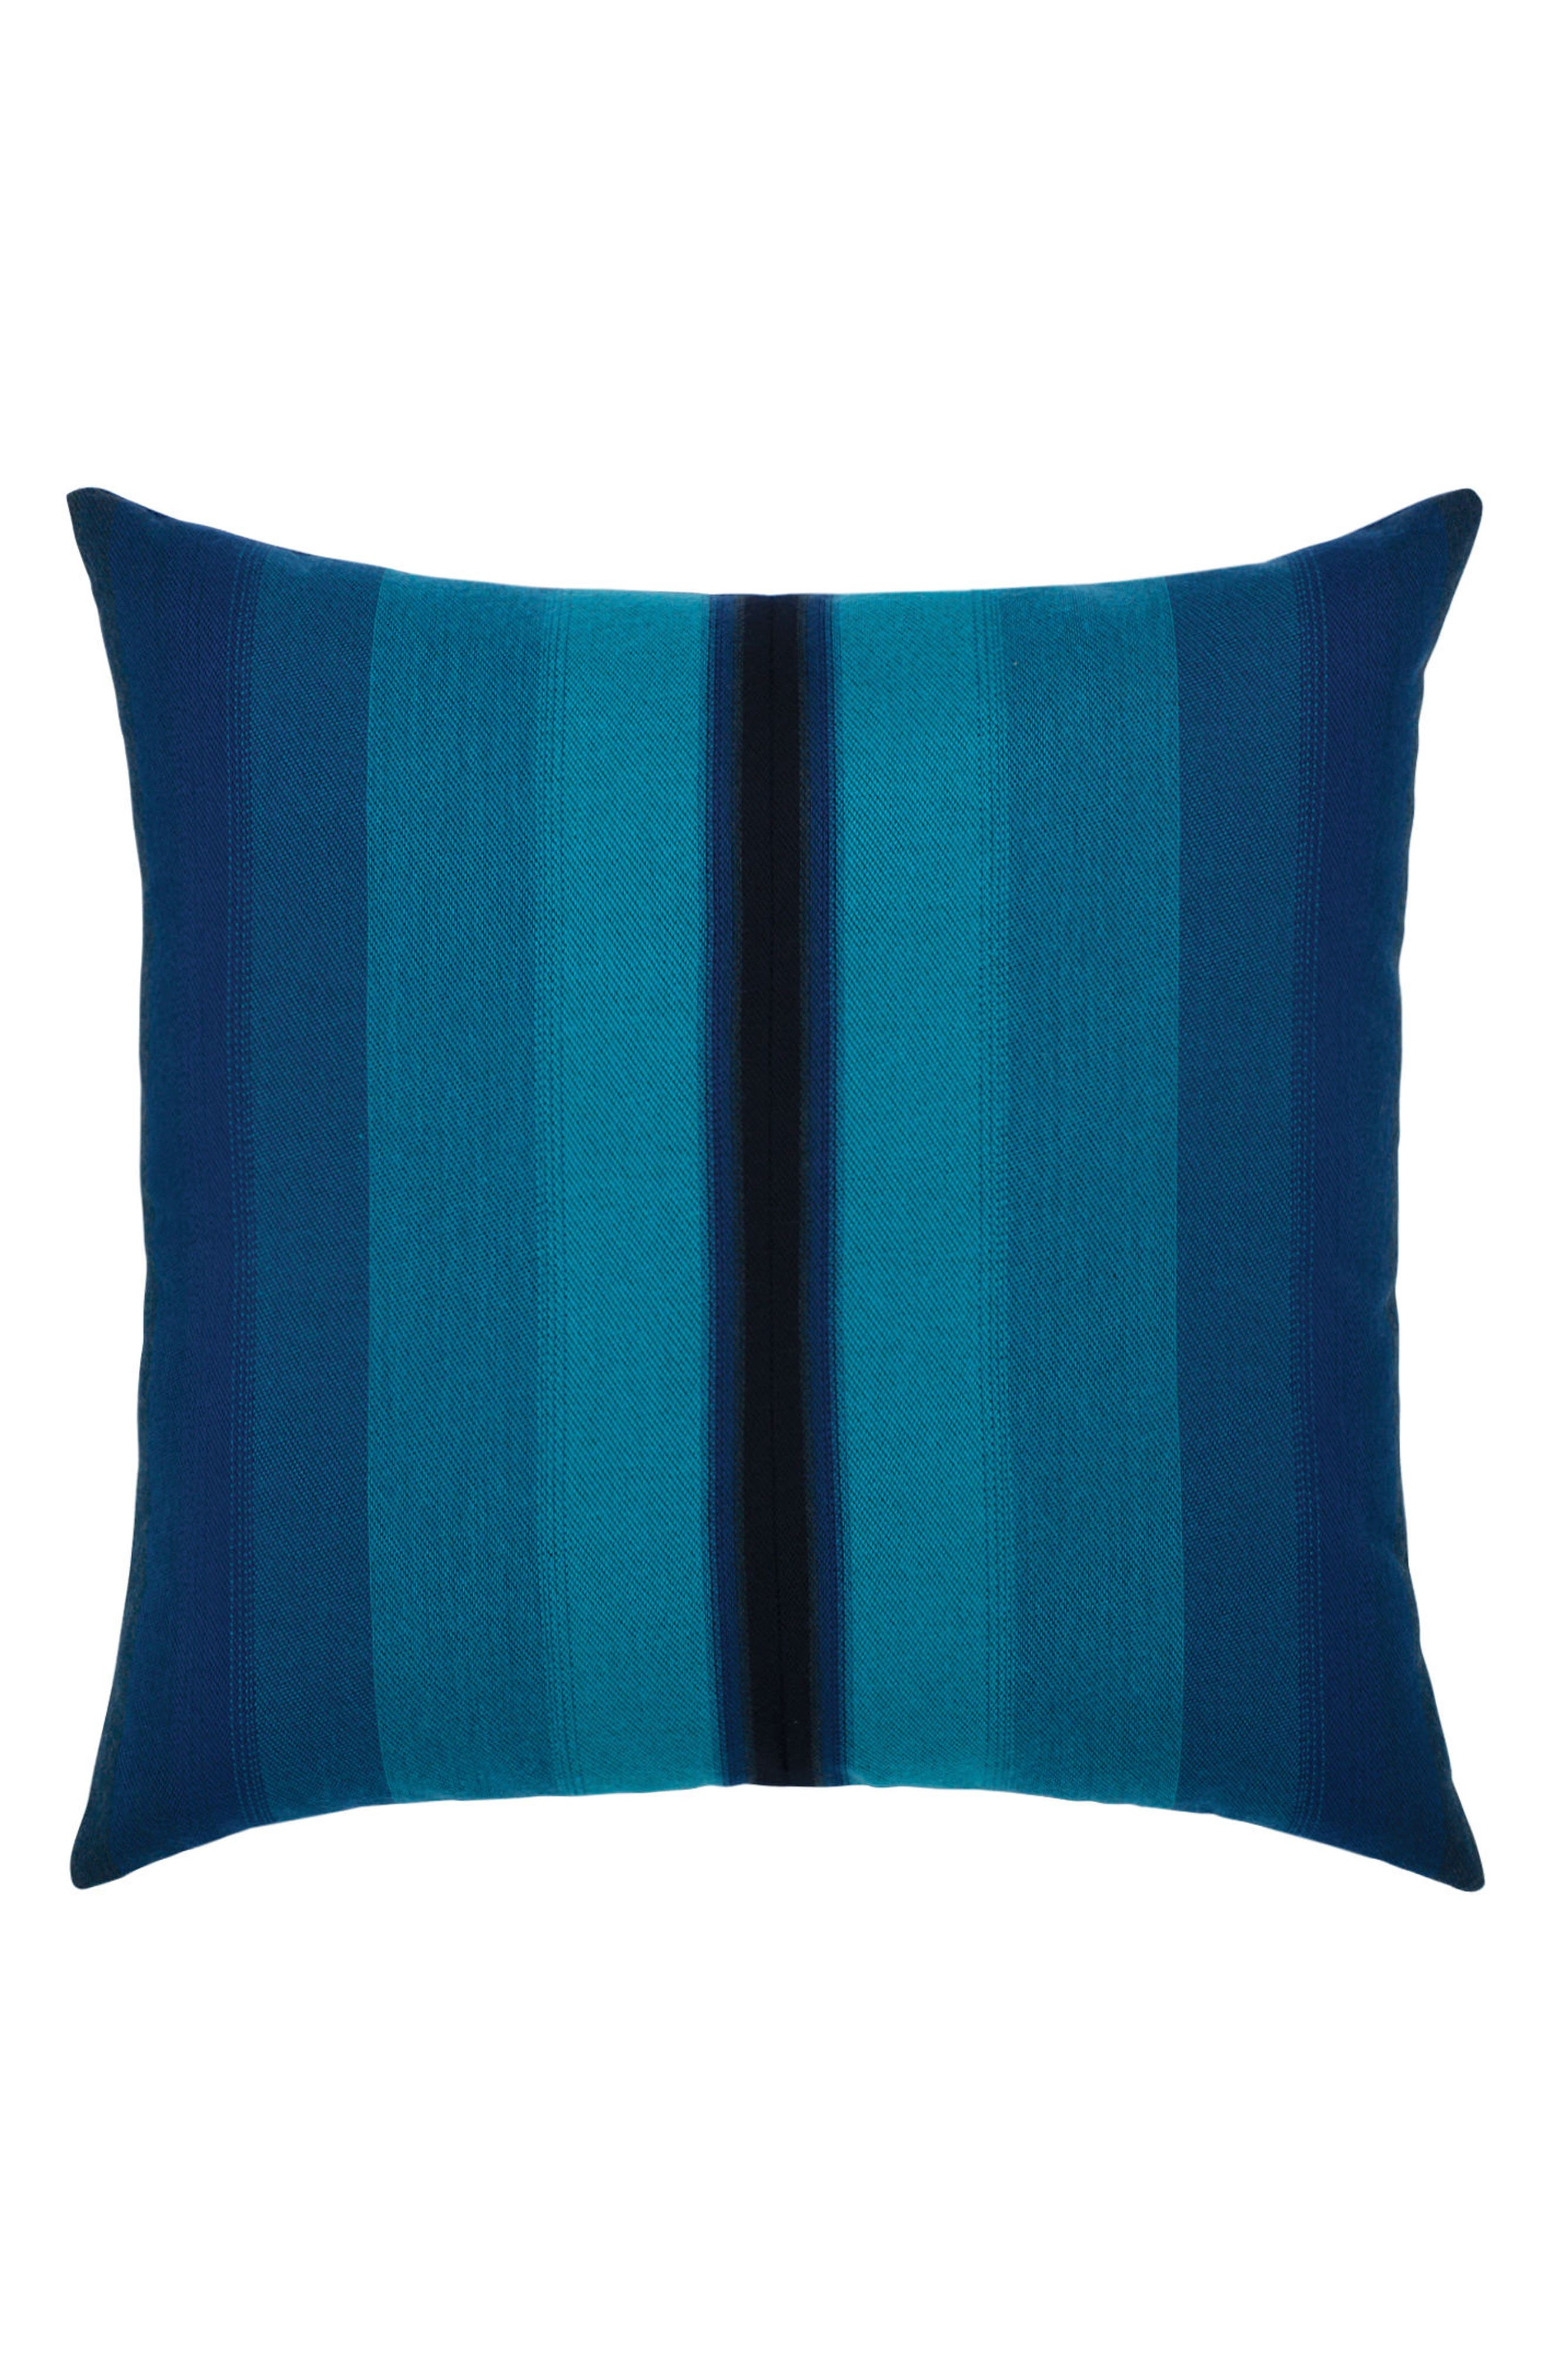 Ombré Azure Indoor/Outdoor Accent Pillow,                         Main,                         color, 400